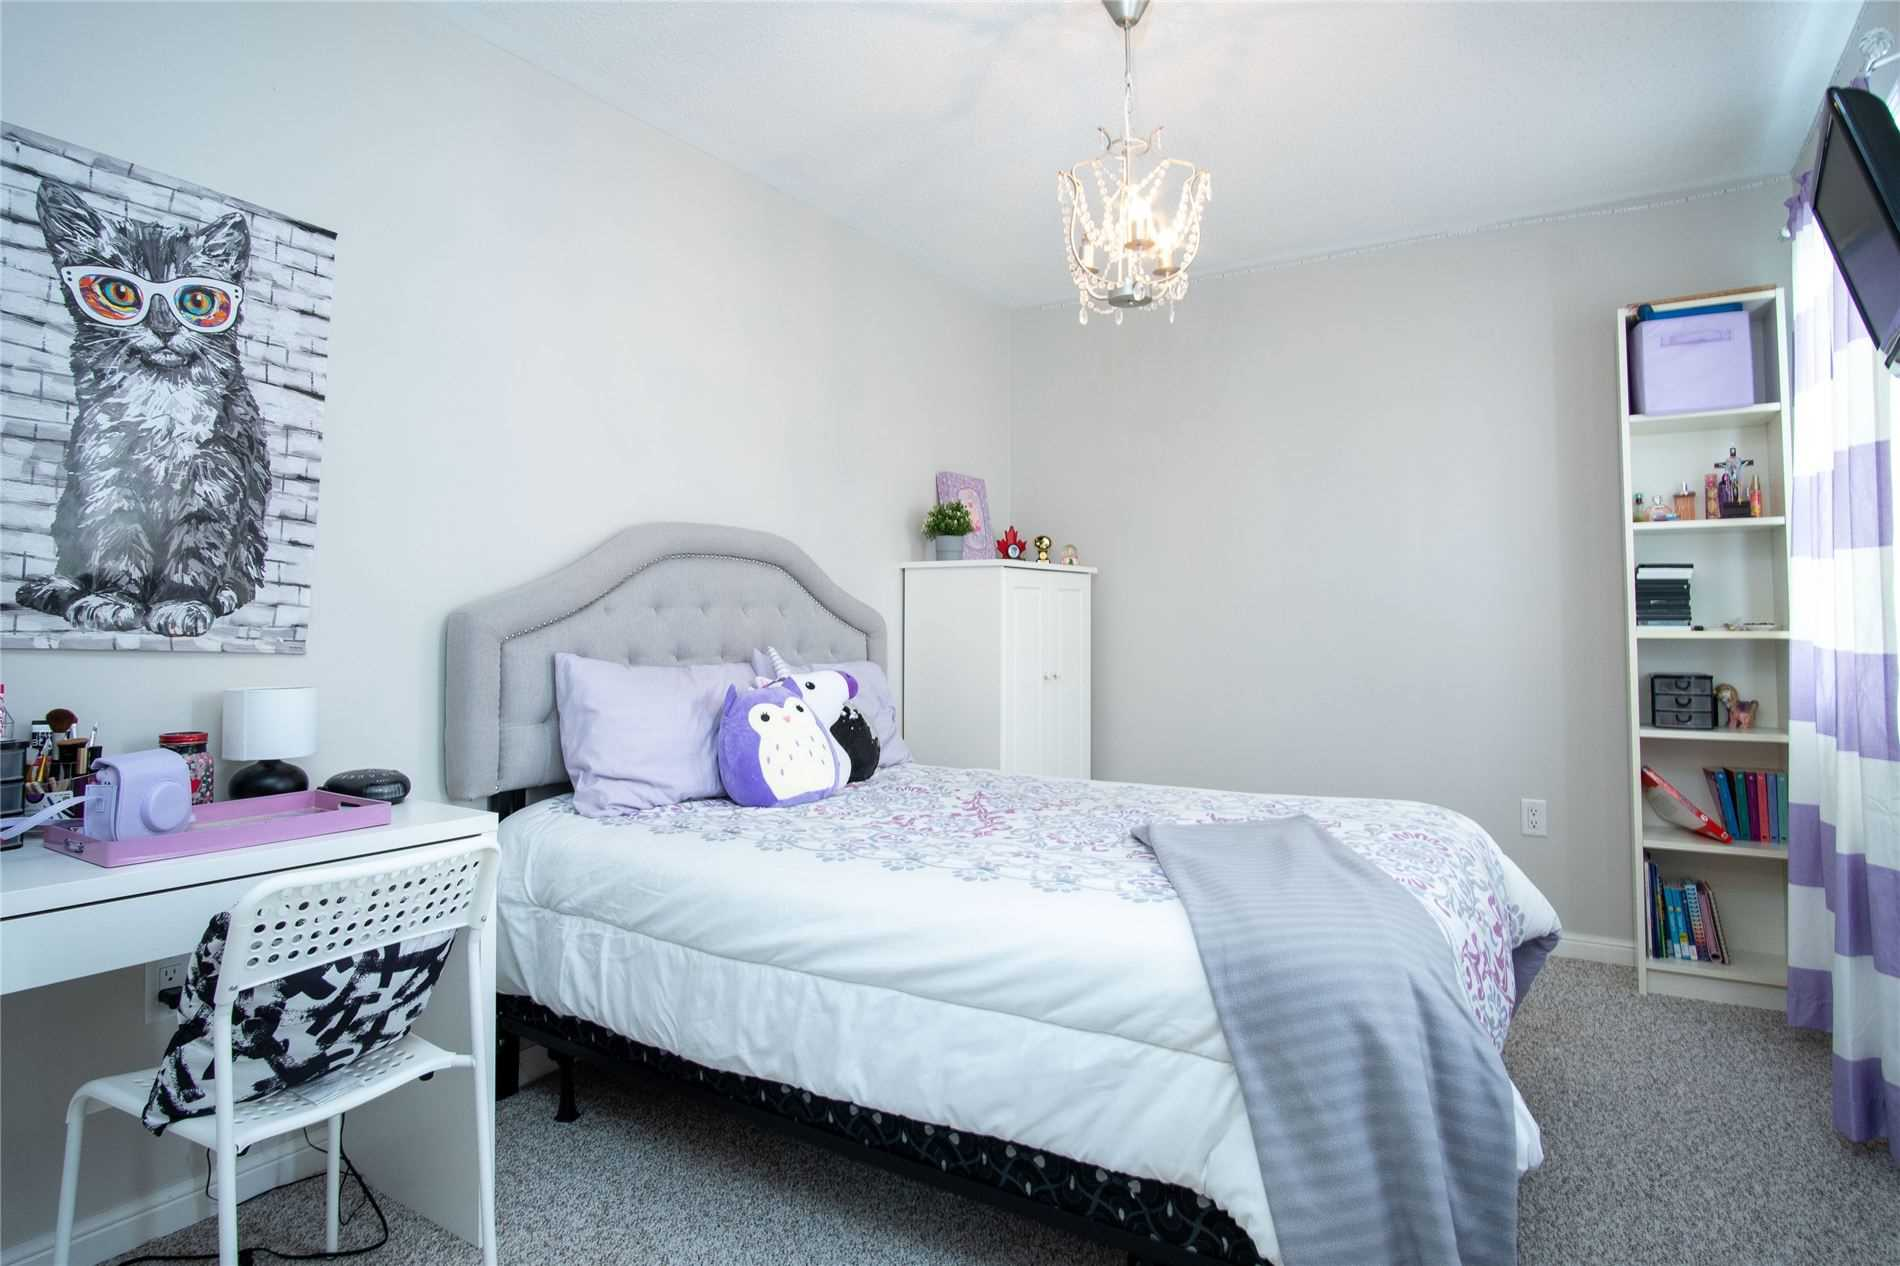 827 Biggar Hts - Coates Detached for sale, 4 Bedrooms (W5400280) - #19